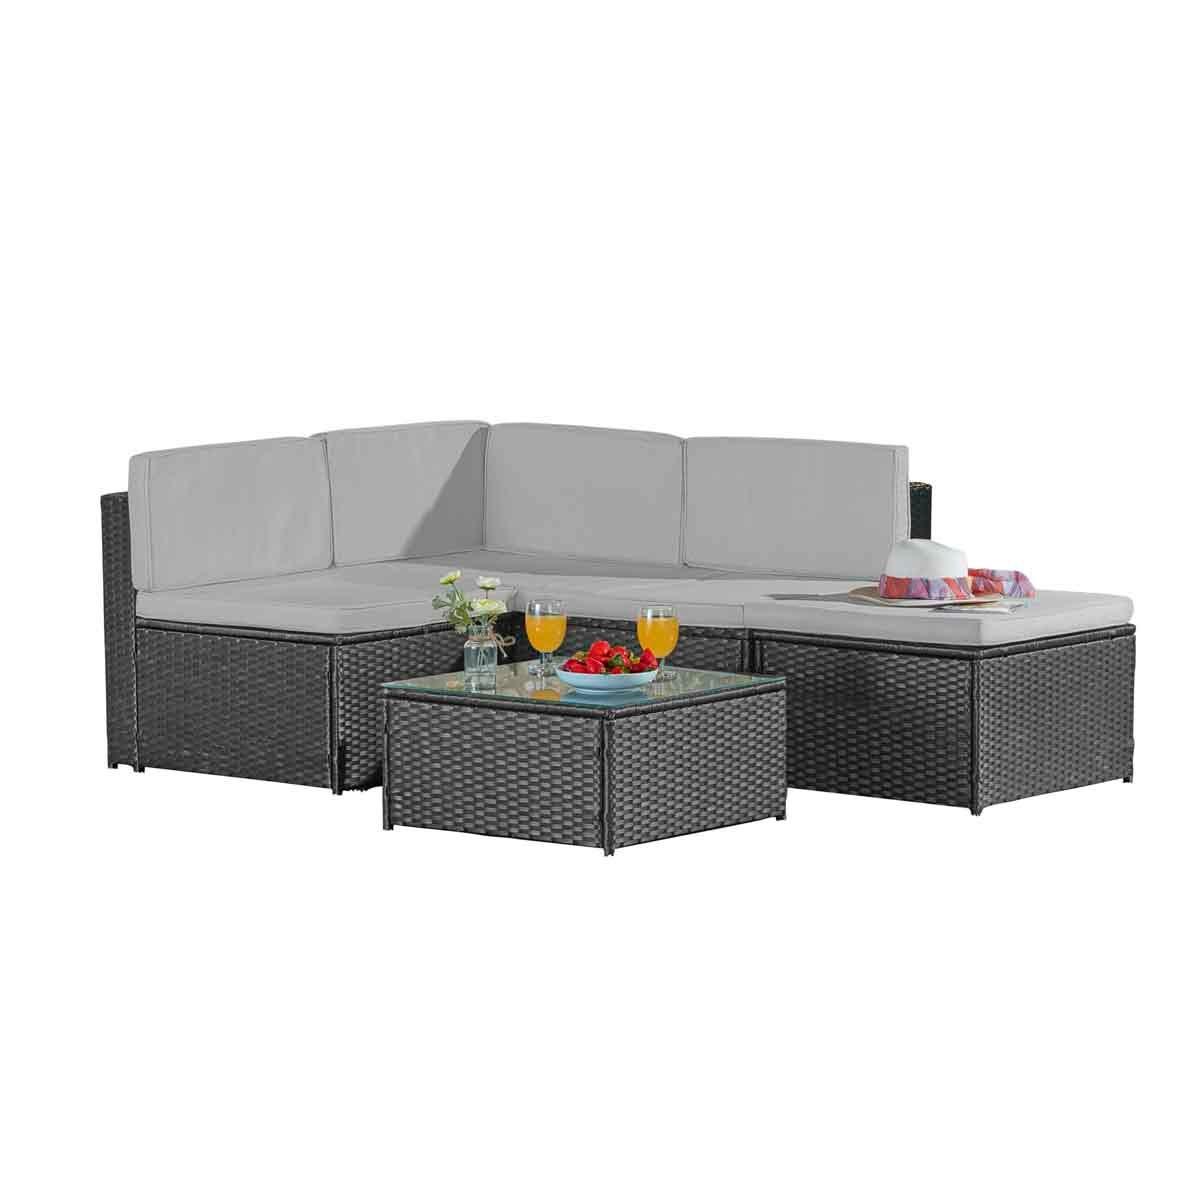 Garden Gear Milan Rattan Lounge Sofa Set with Cover - Grey